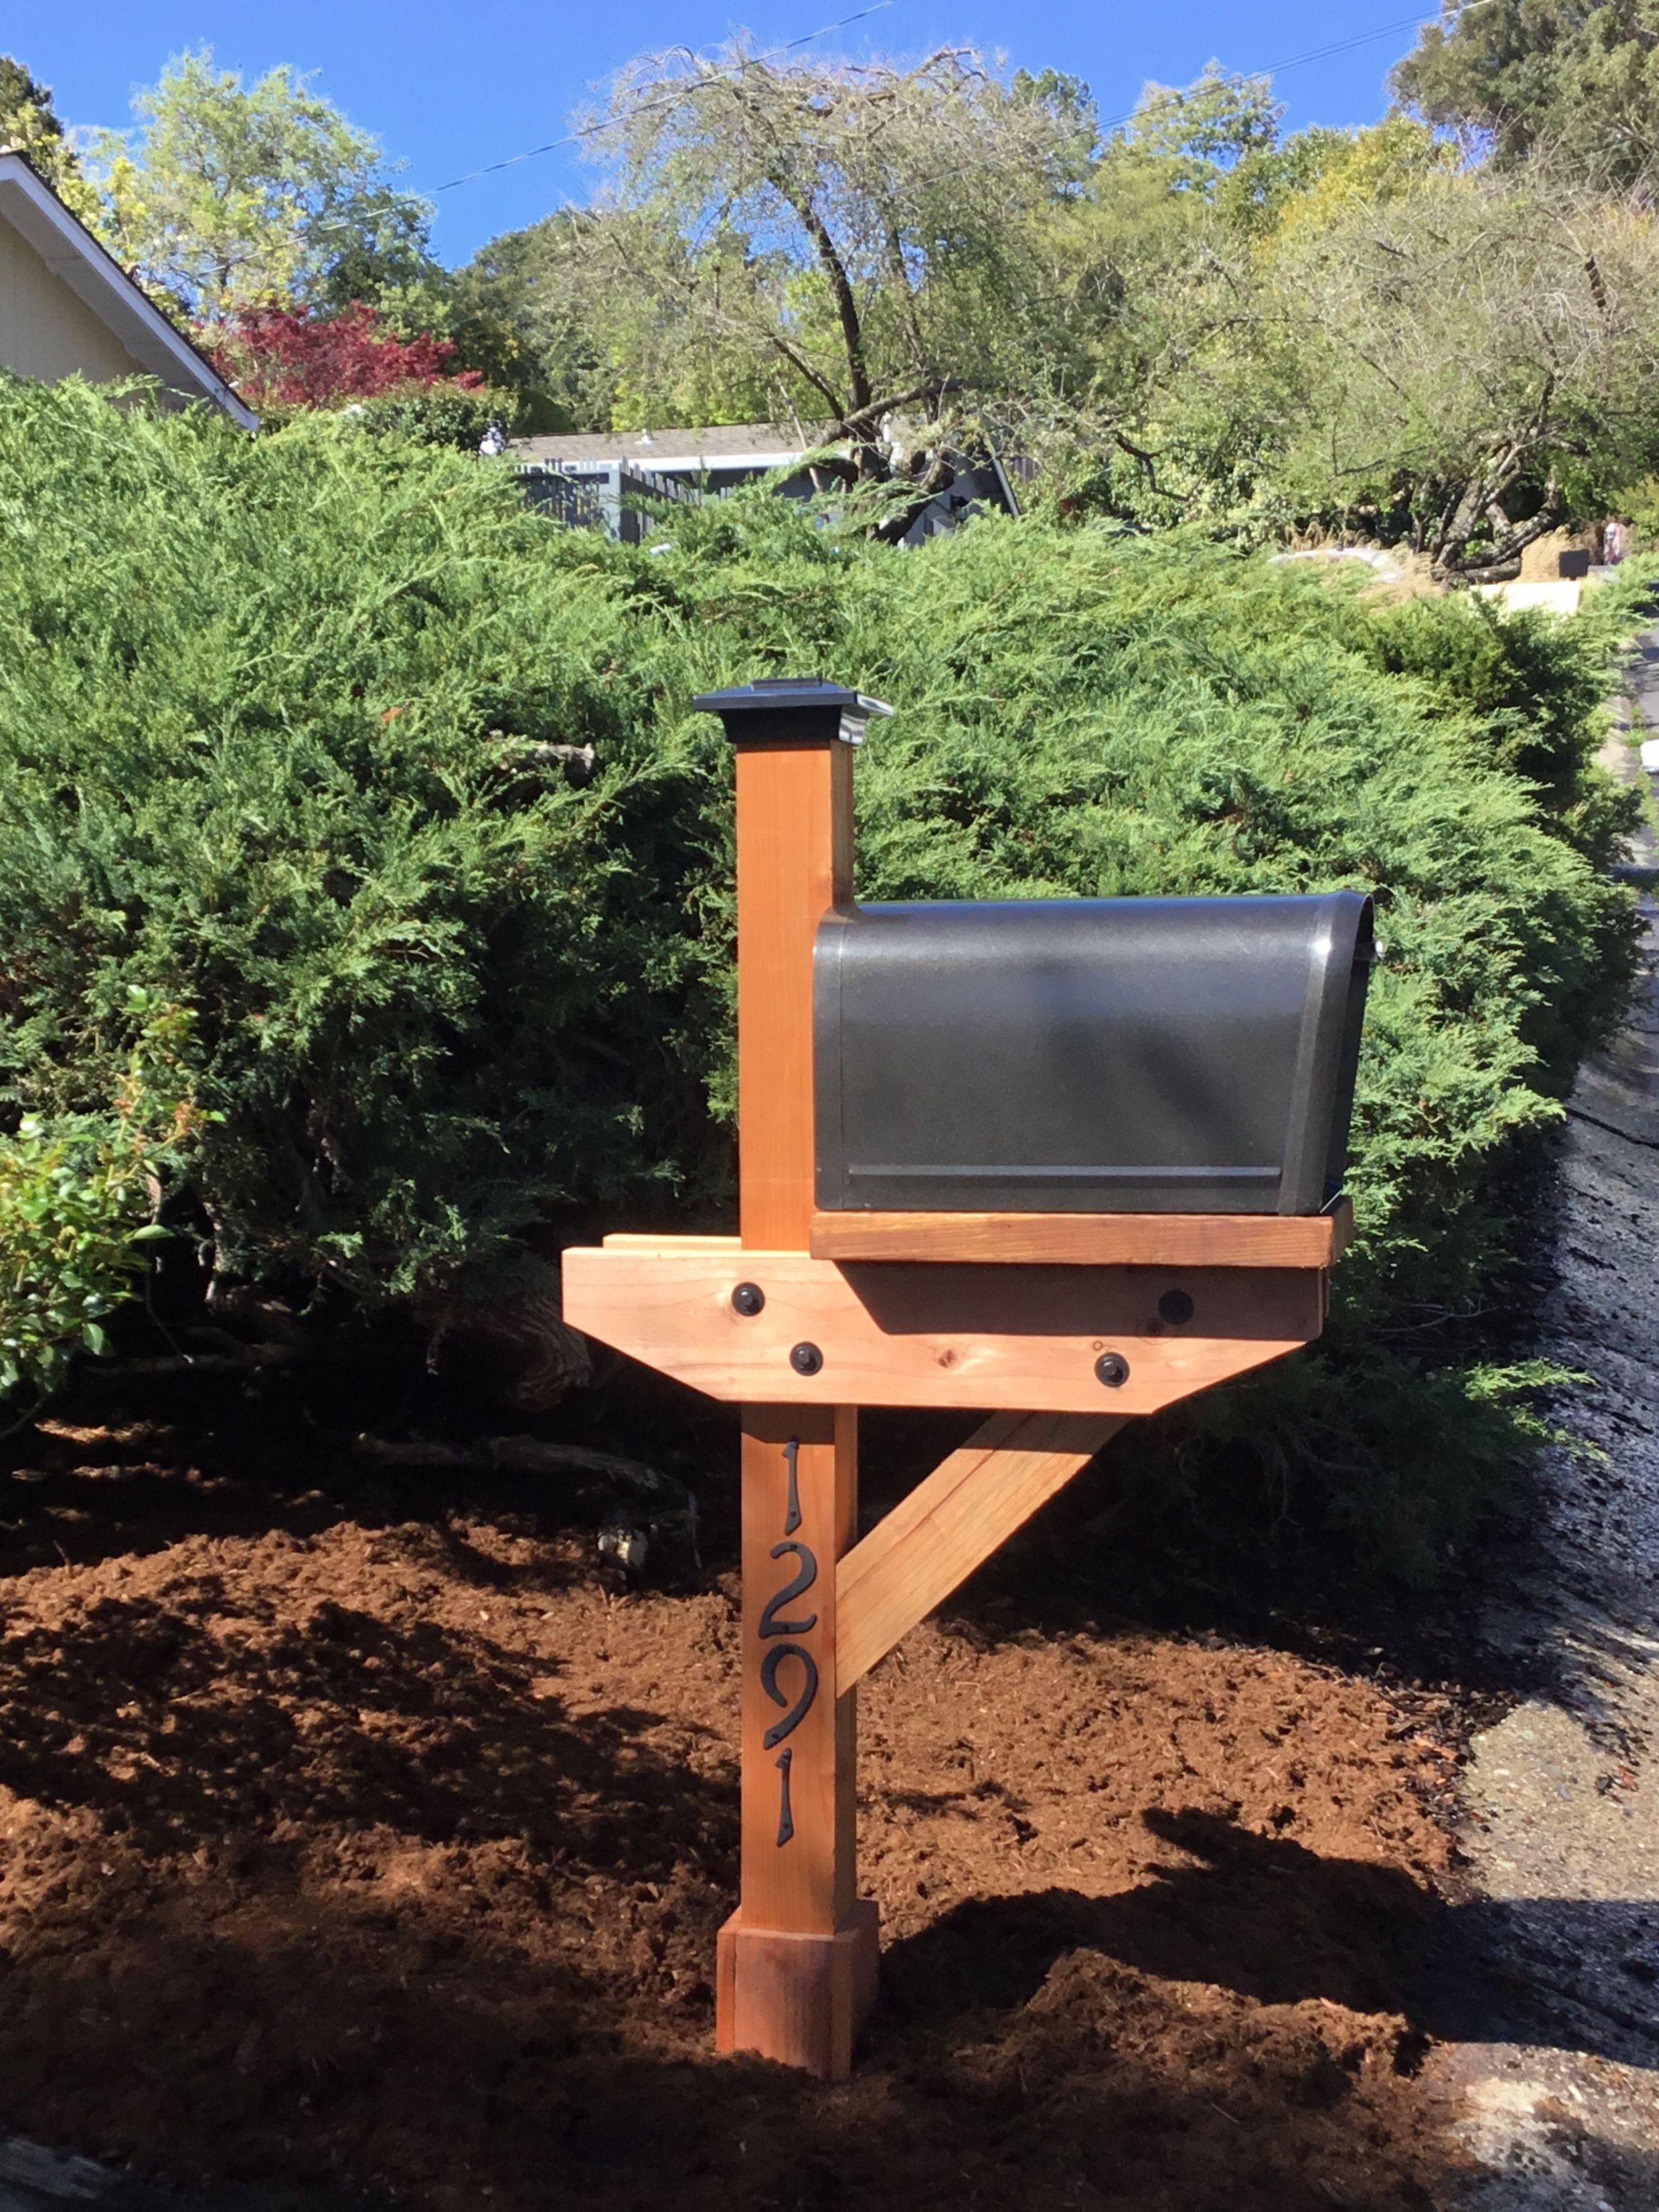 New Maibox Rustic Mailboxes Diy Mailbox Rural Mailbox